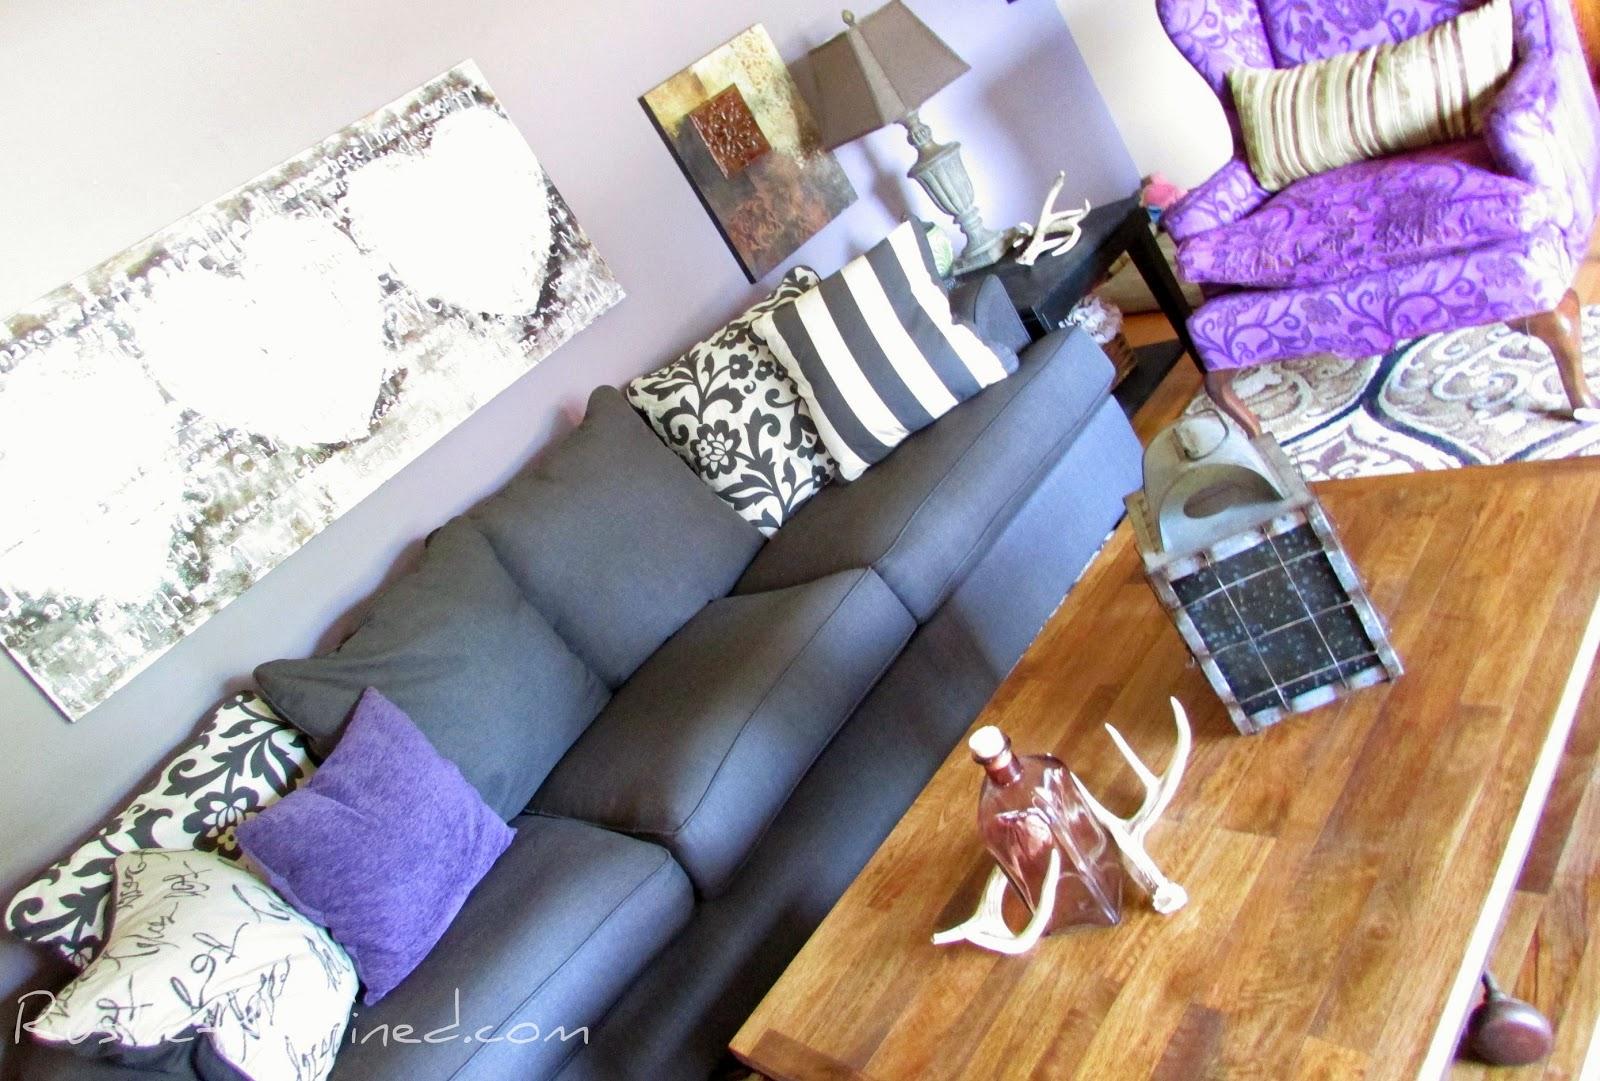 Summer Living Room Tour @ Rustic-refined.com